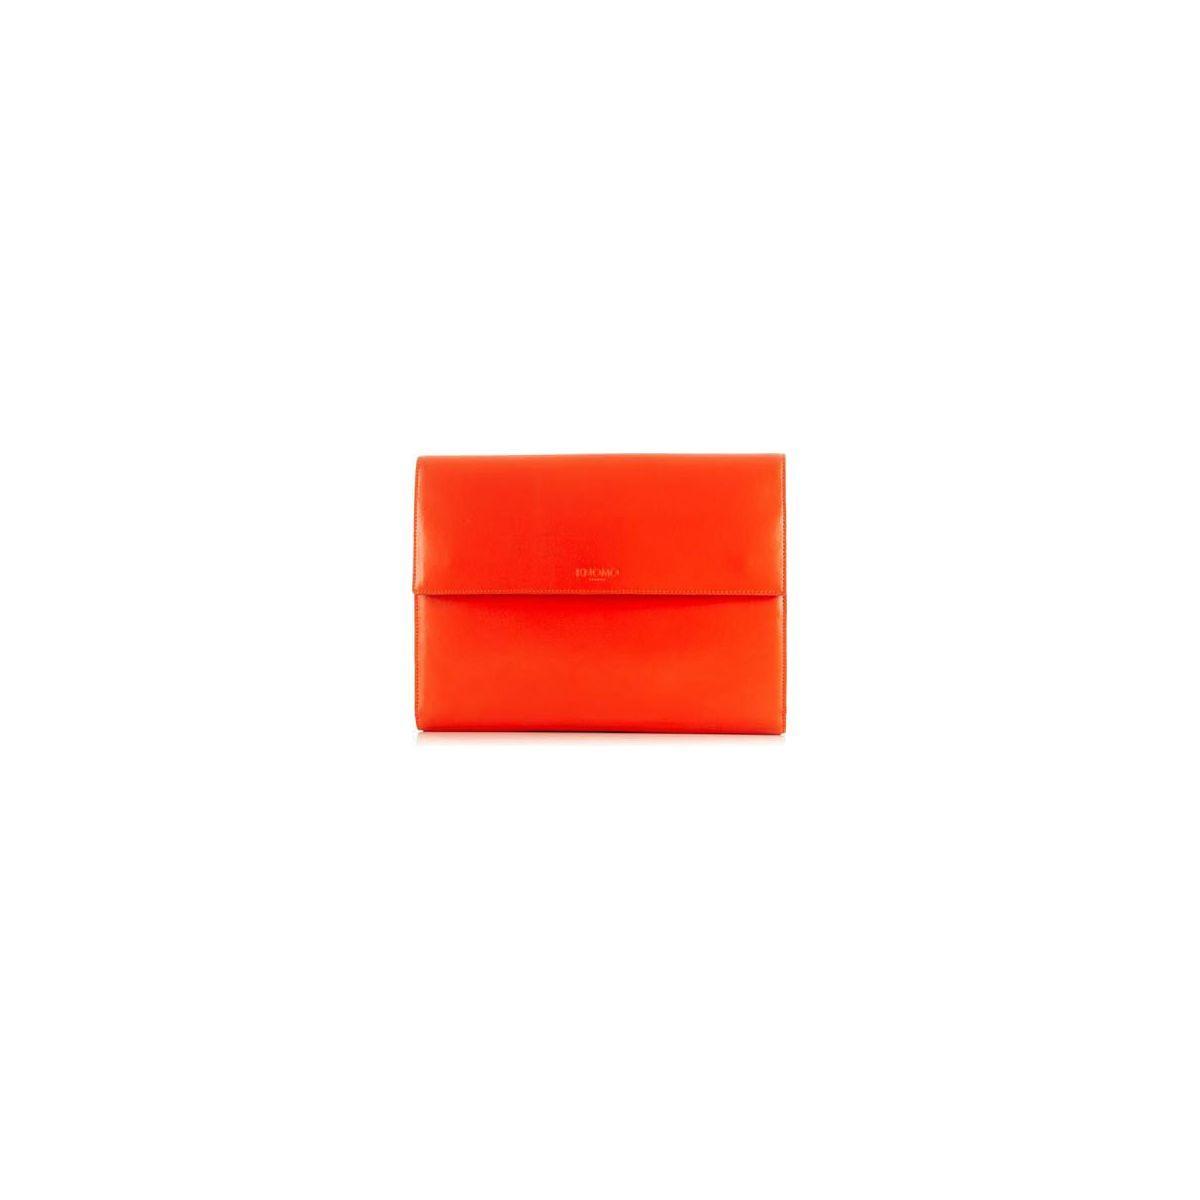 Folio knomo organizer 10' rouge - 20% de remise imm�diate avec le code : priv20 (photo)